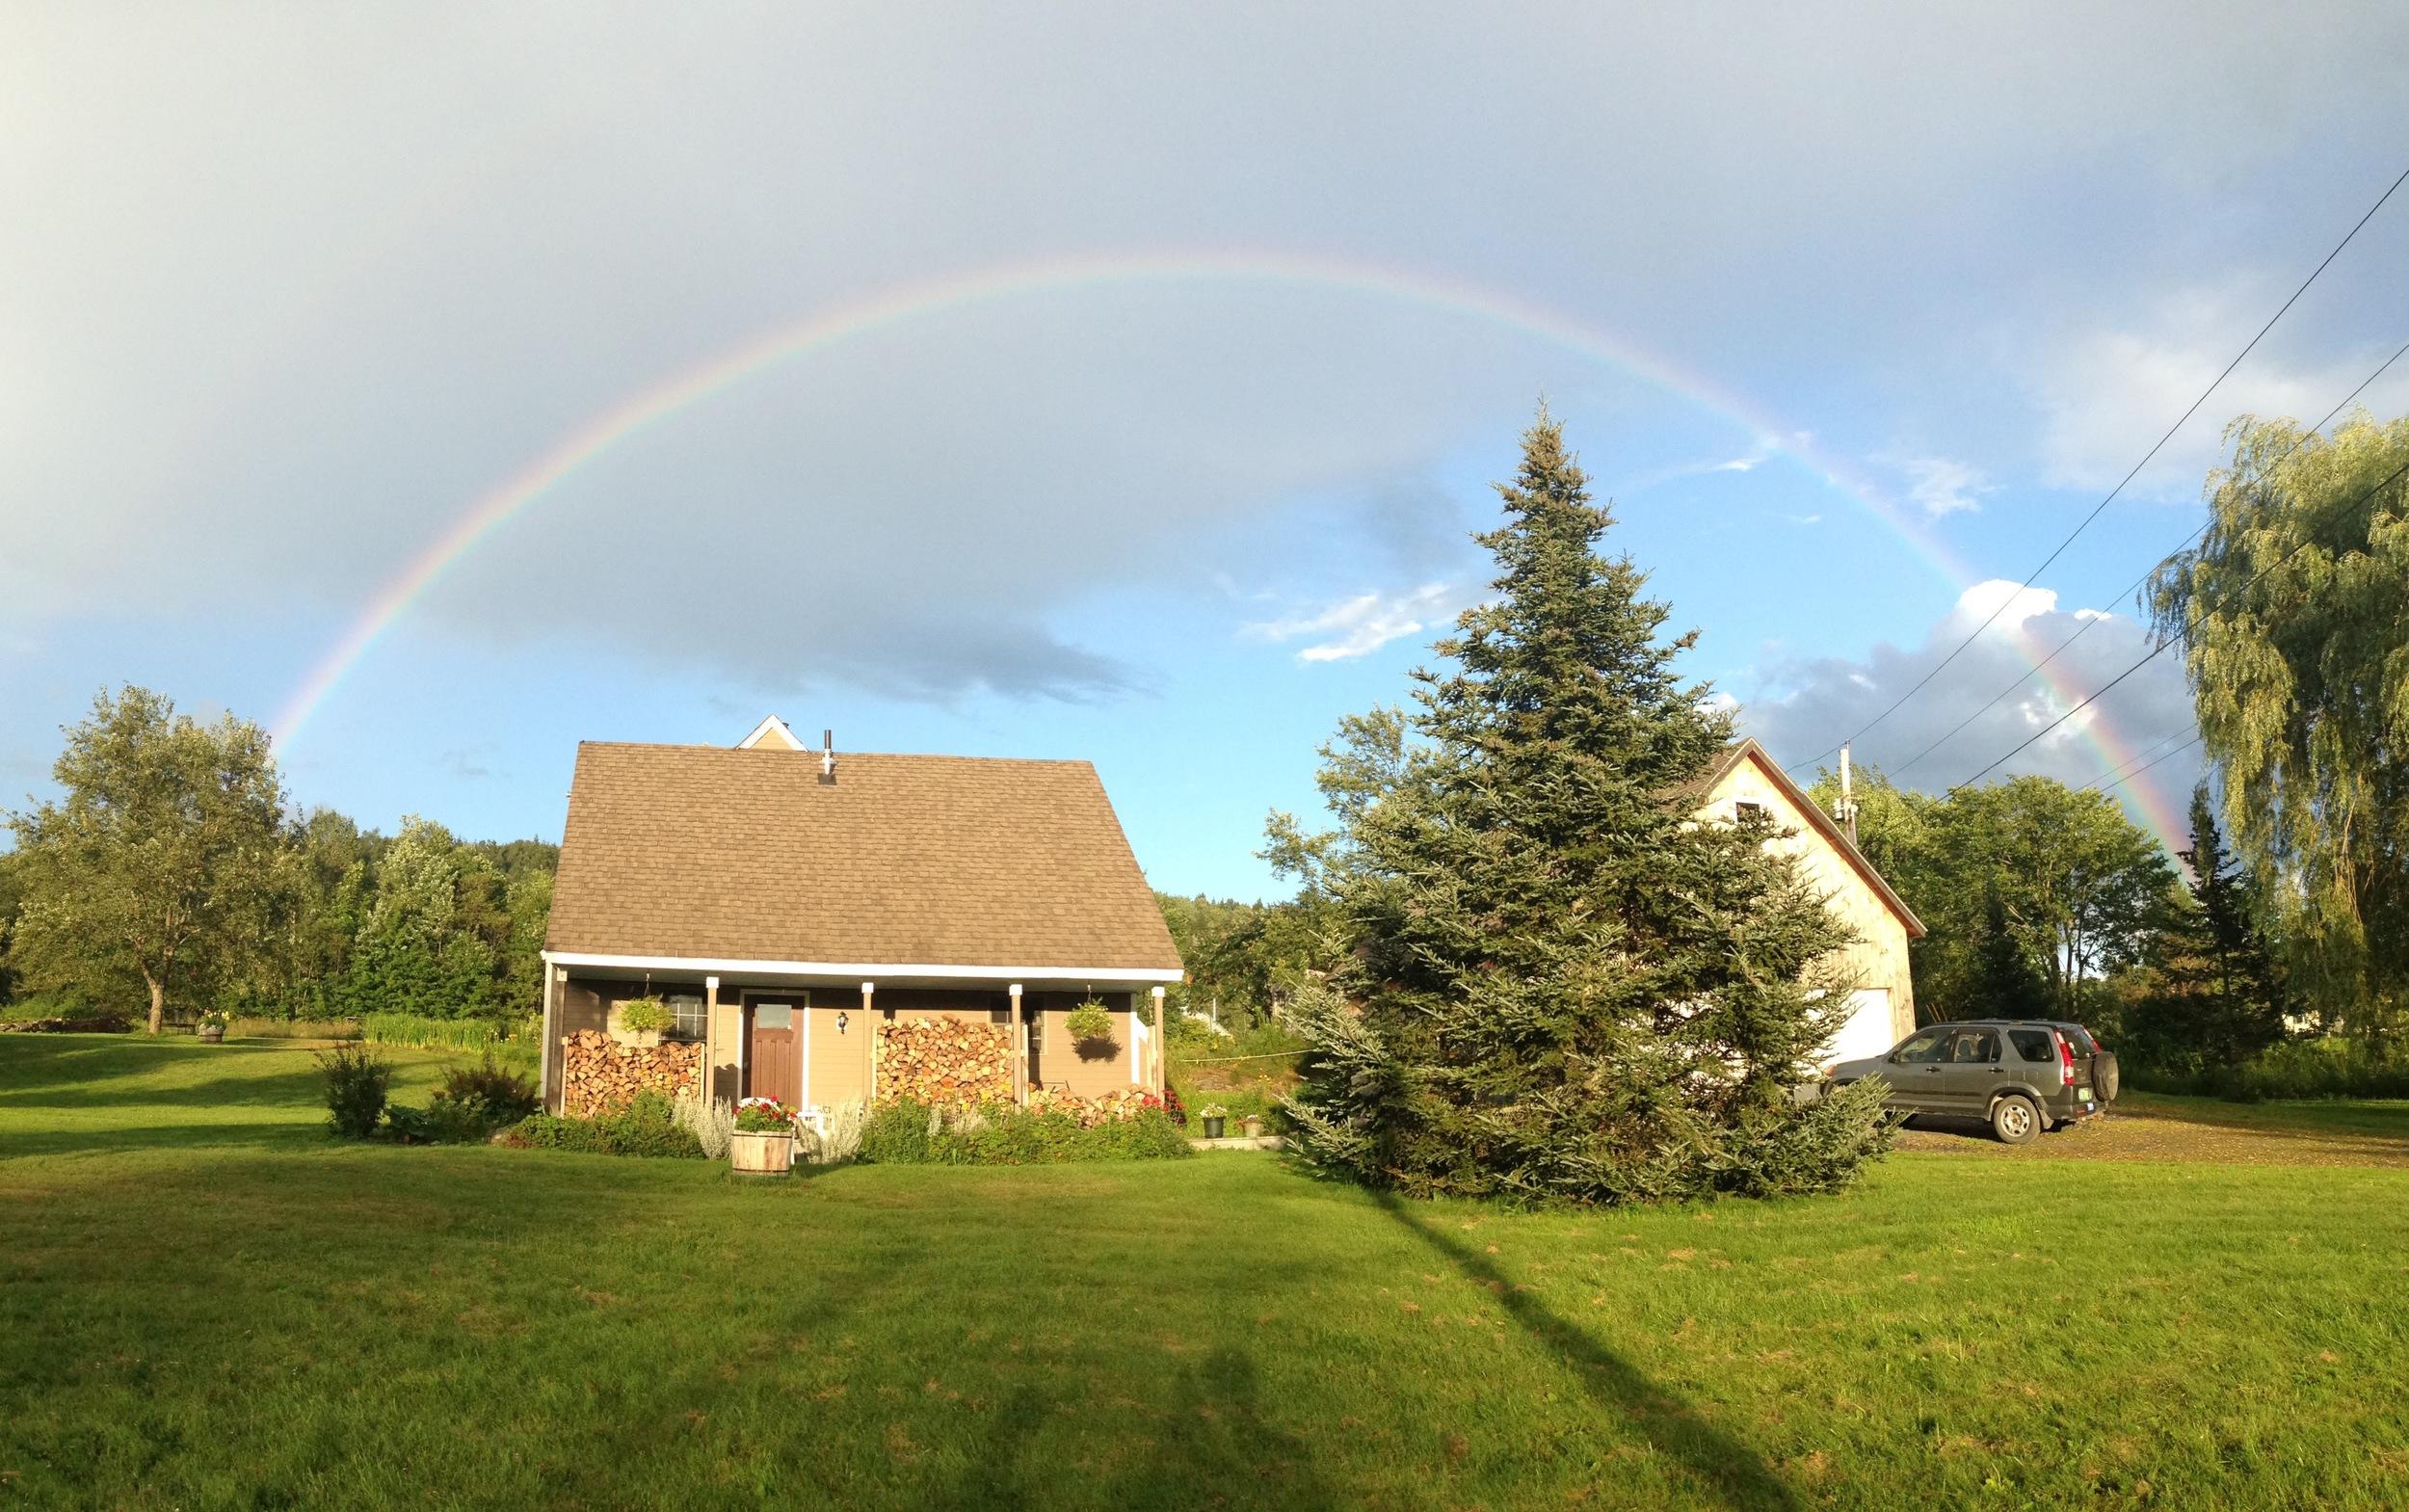 Mother Nature's work of art, last evening